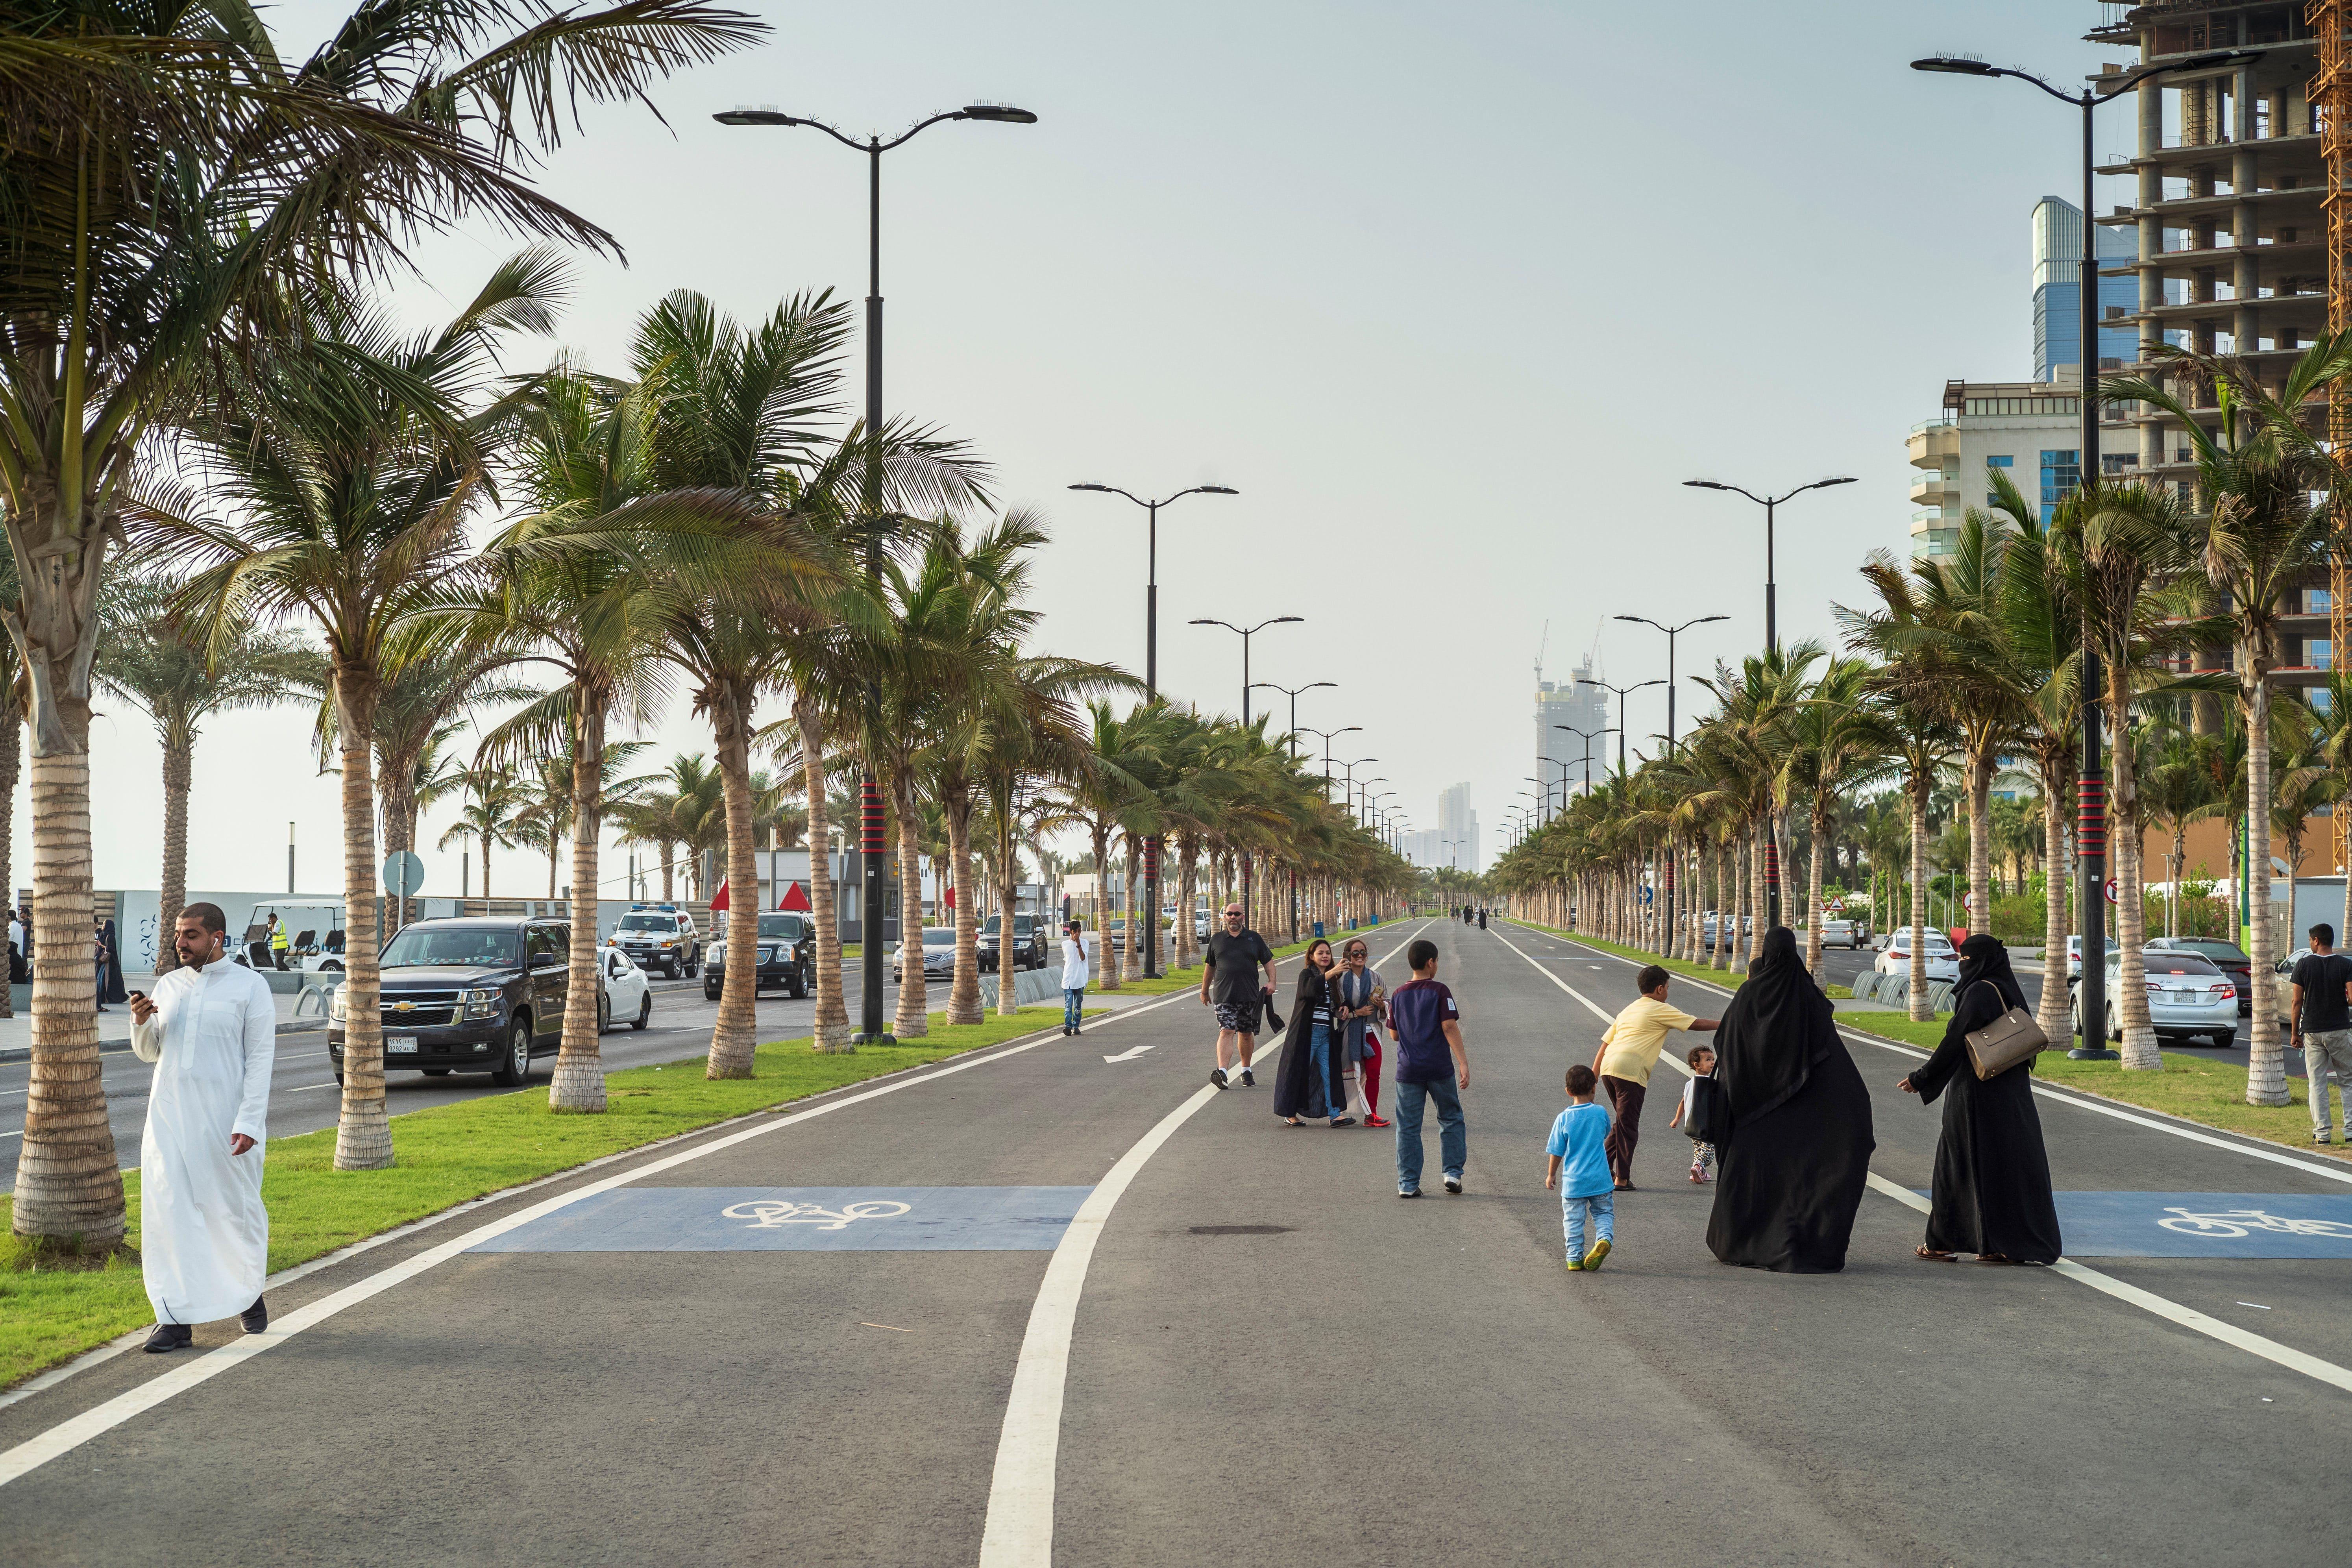 Mosques Markets And Motoring Women Jeddah Saudi Arabia In Pictures Jeddah Jeddah Saudi Arabia Beaches Jeddah Saudi Arabia